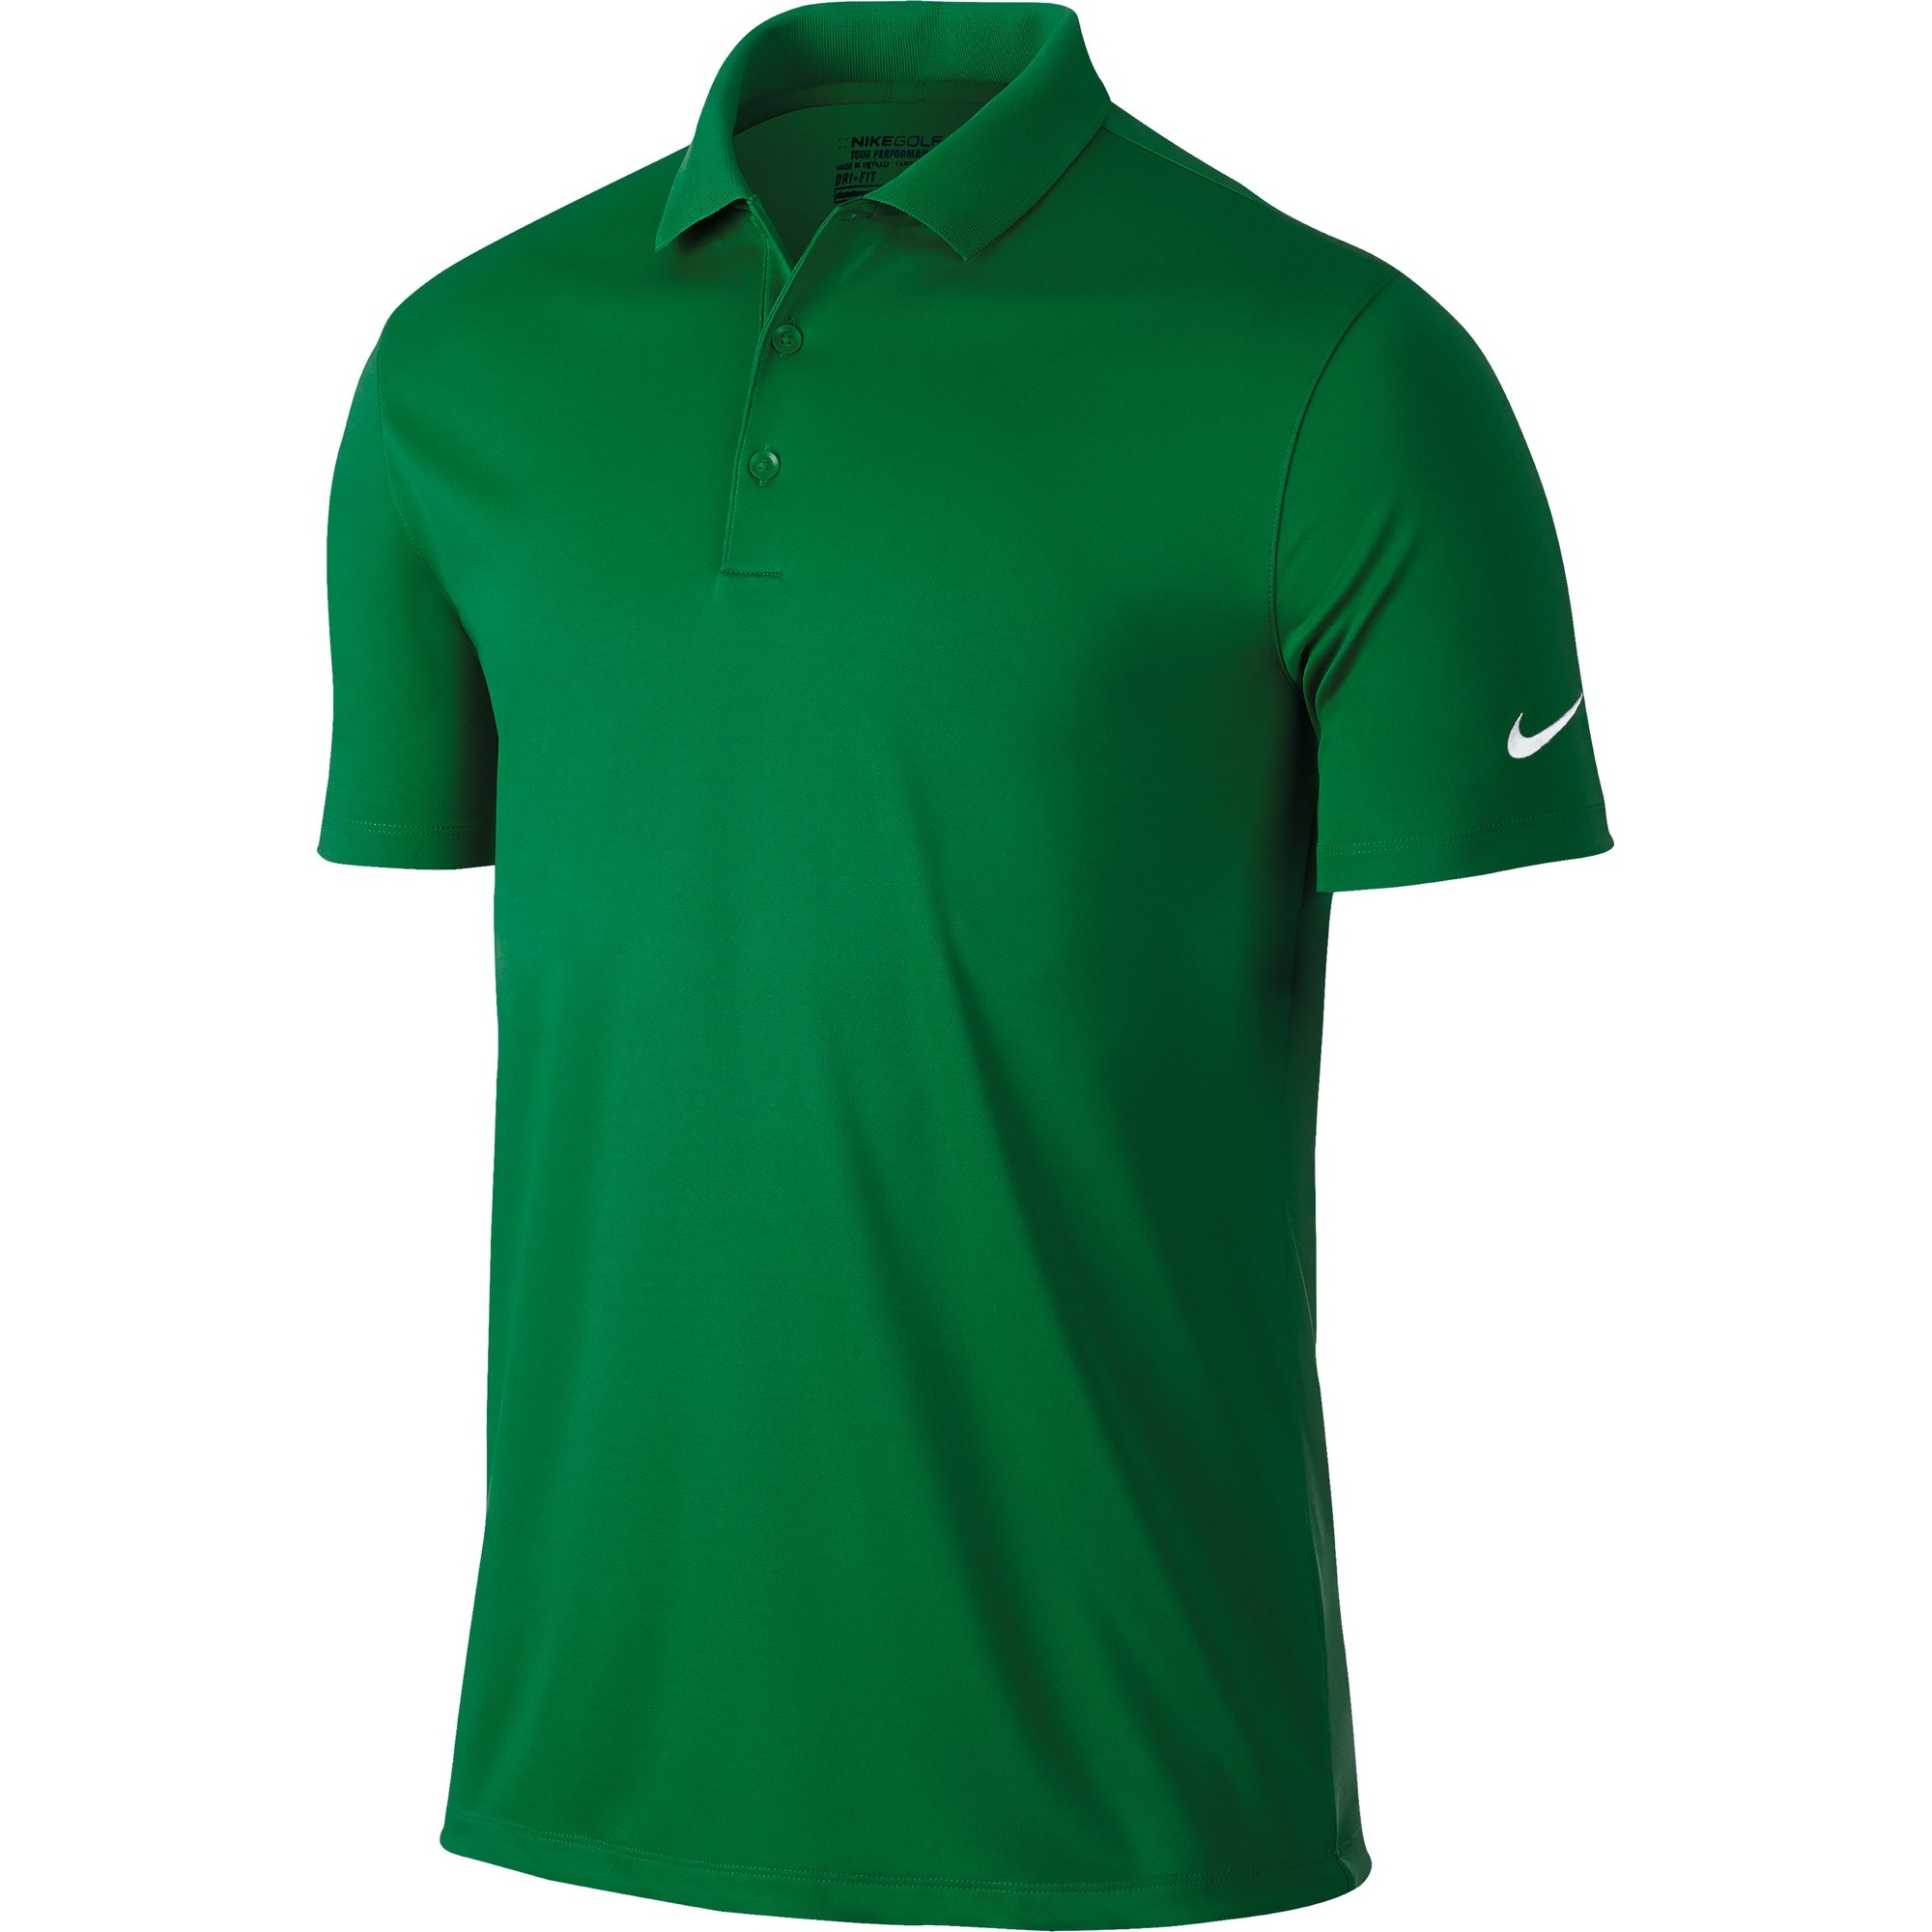 Nike Mens Victory Short Sleeve Solid Polo Shirt | eBay